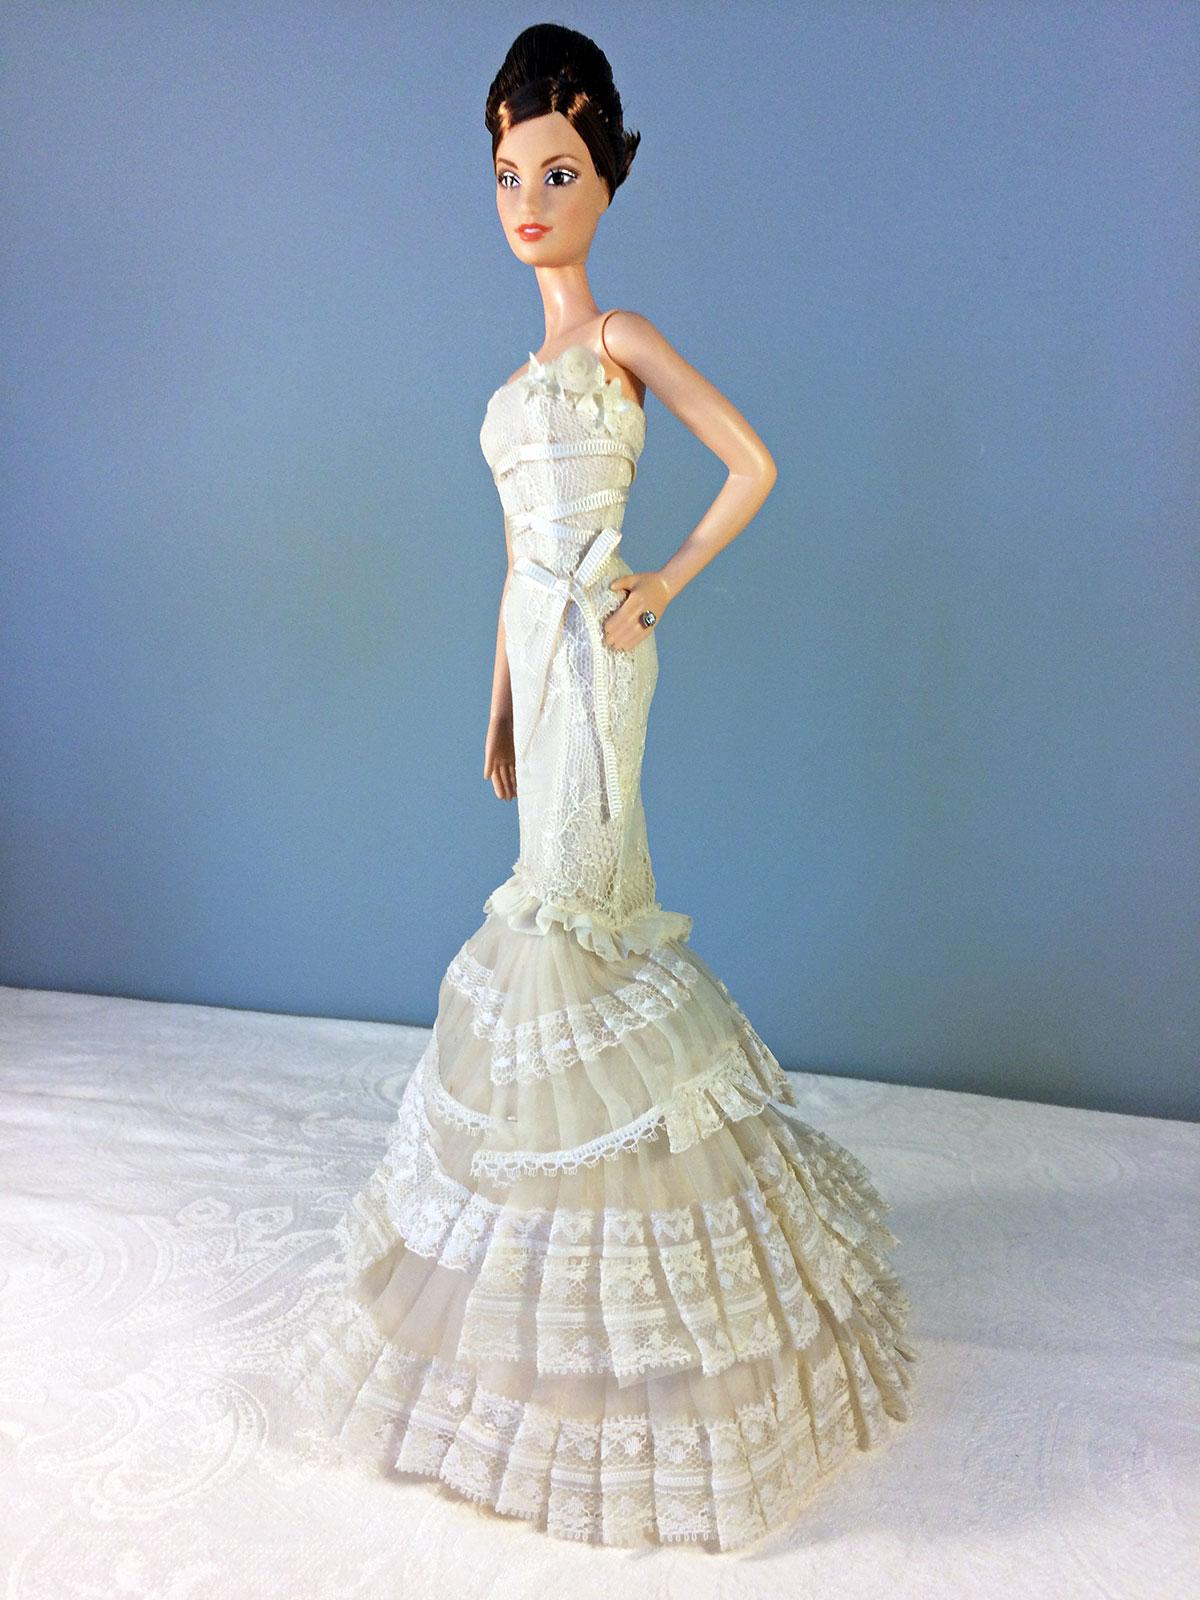 3a008f6ff94c Vera Wang Bride: The Romanticist Barbie Doll - Perfectory Barbie Edition